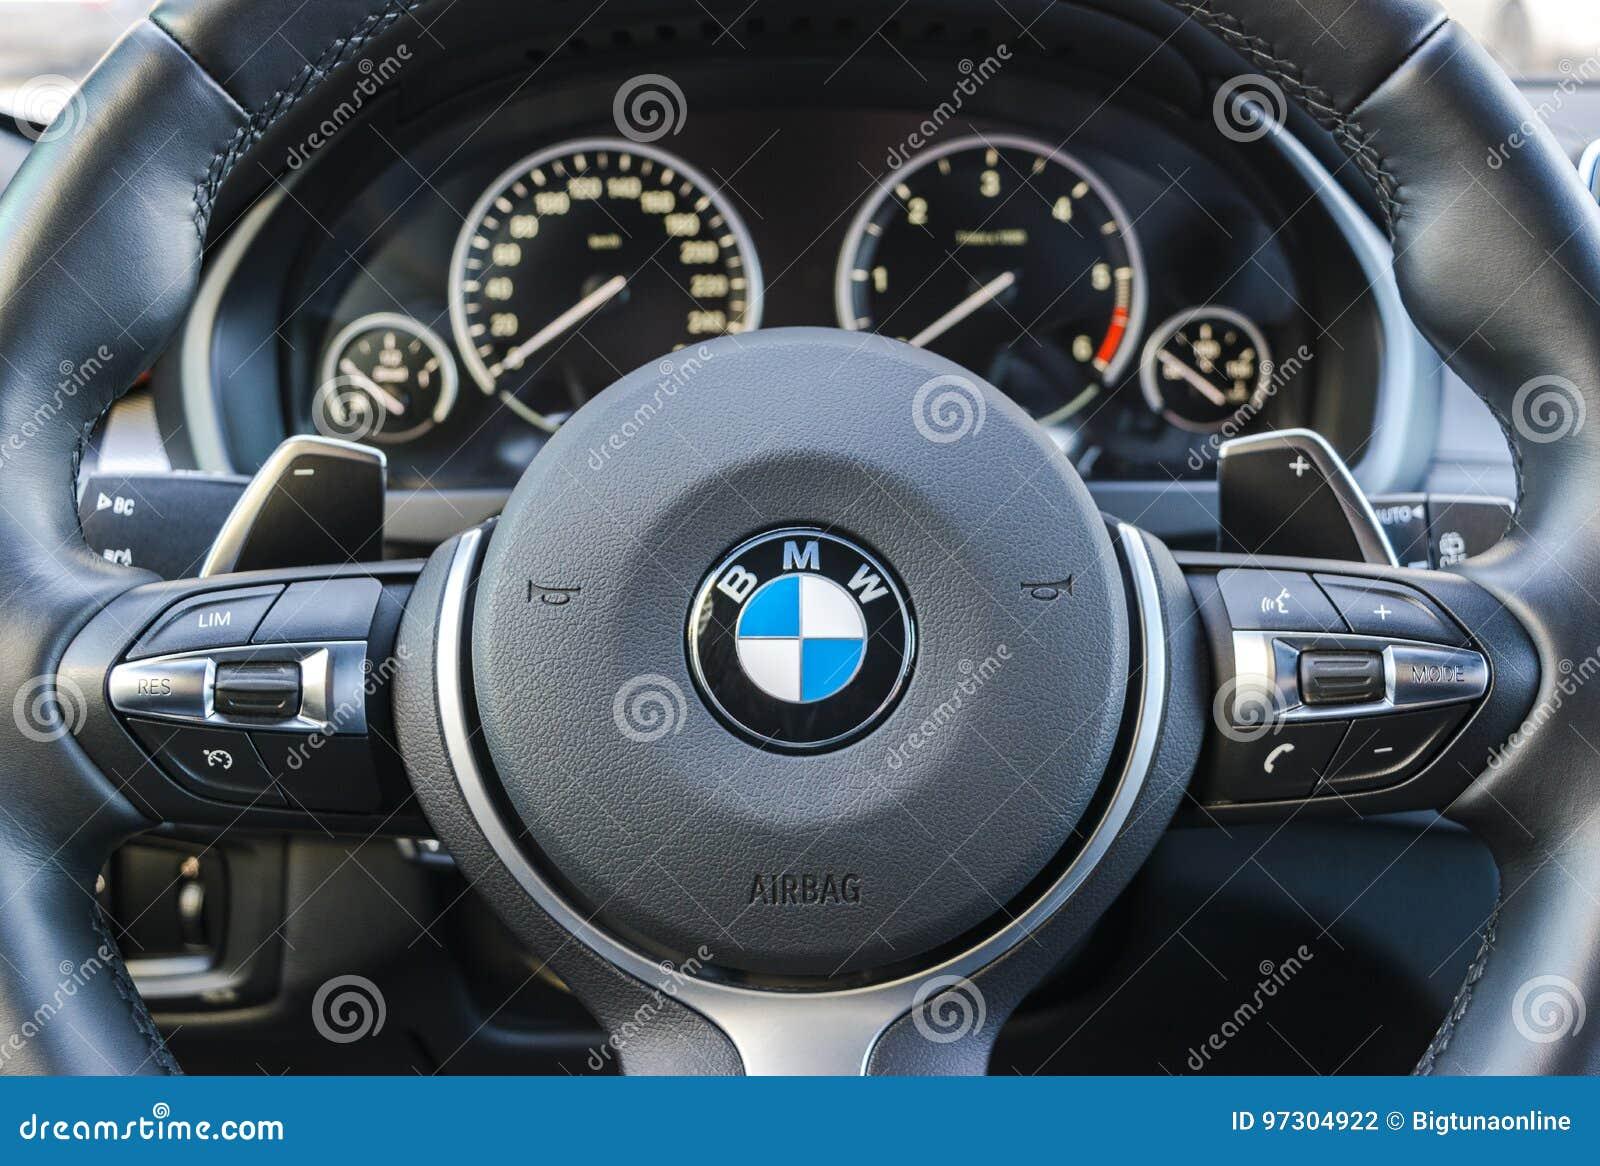 BMW X5M 2017, Close Up Of Steering Wheel, Dashboard Modern ... - photo#43